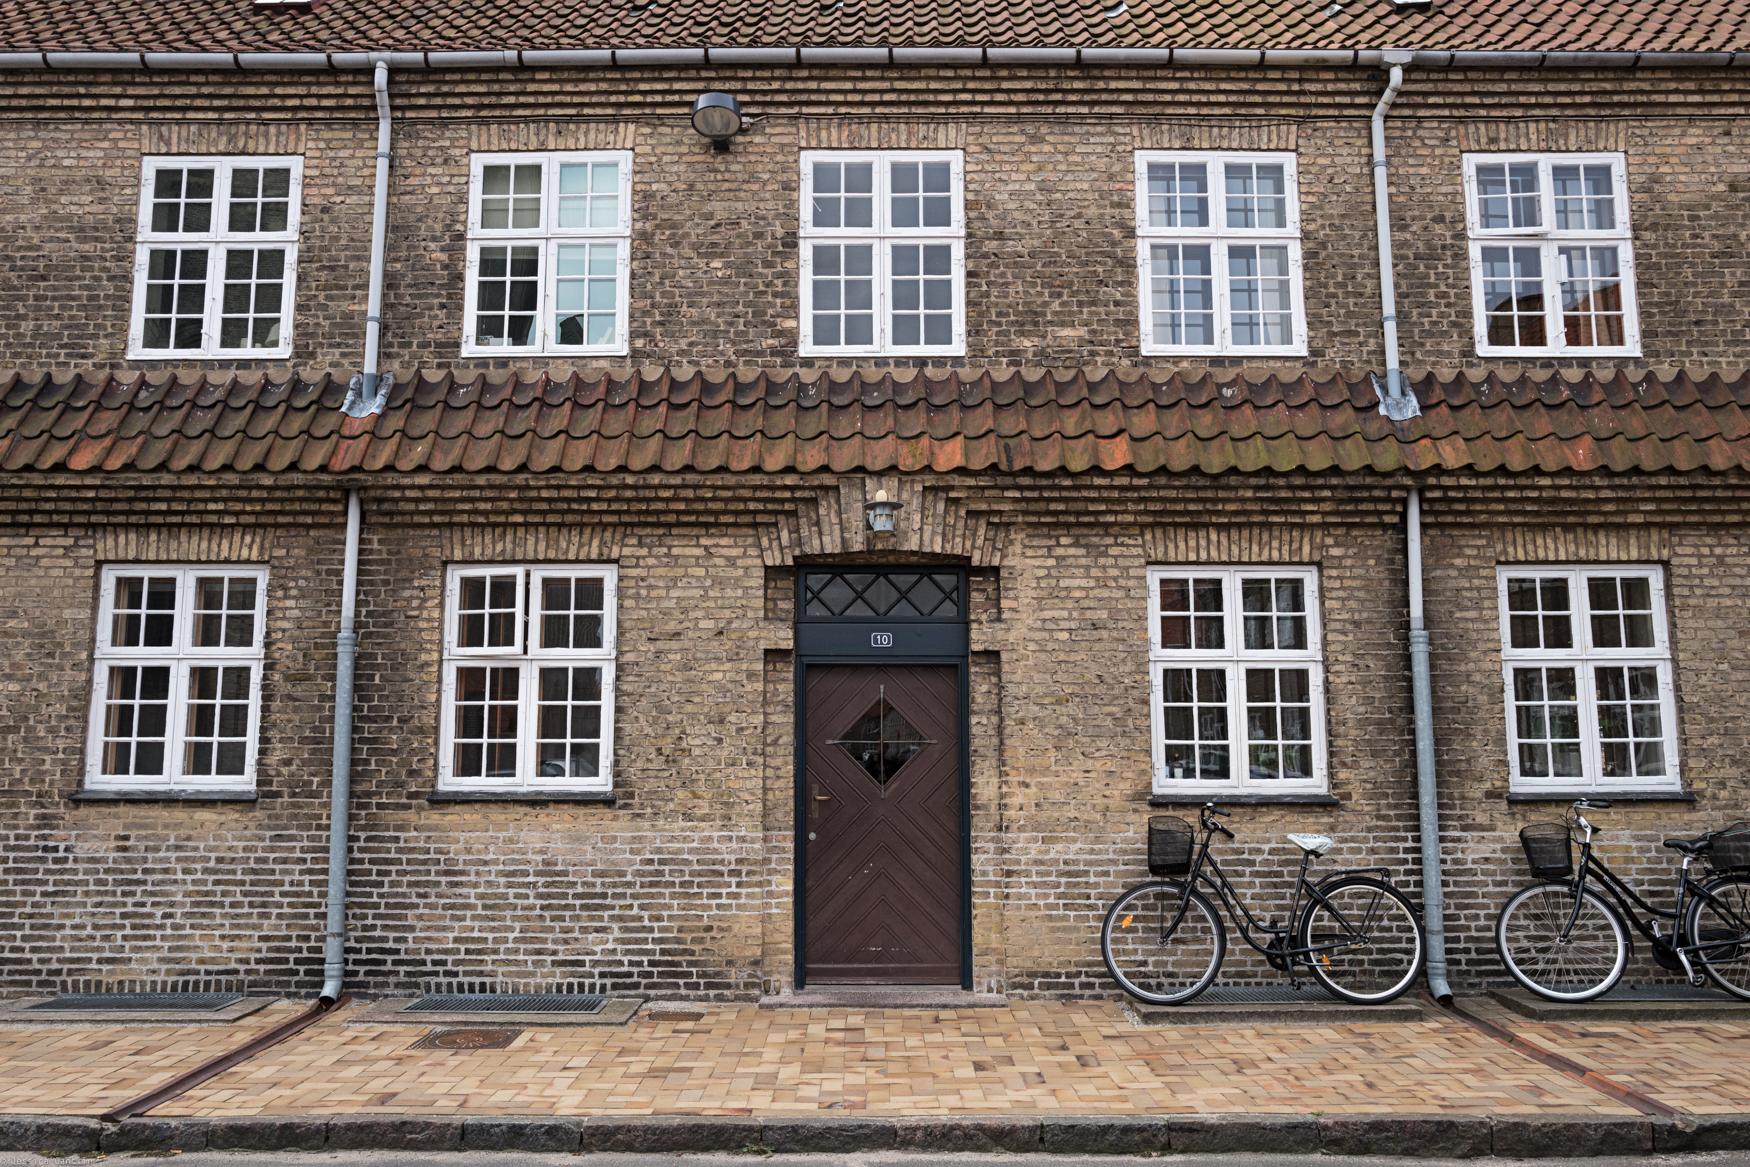 Traditional Danish Architecture